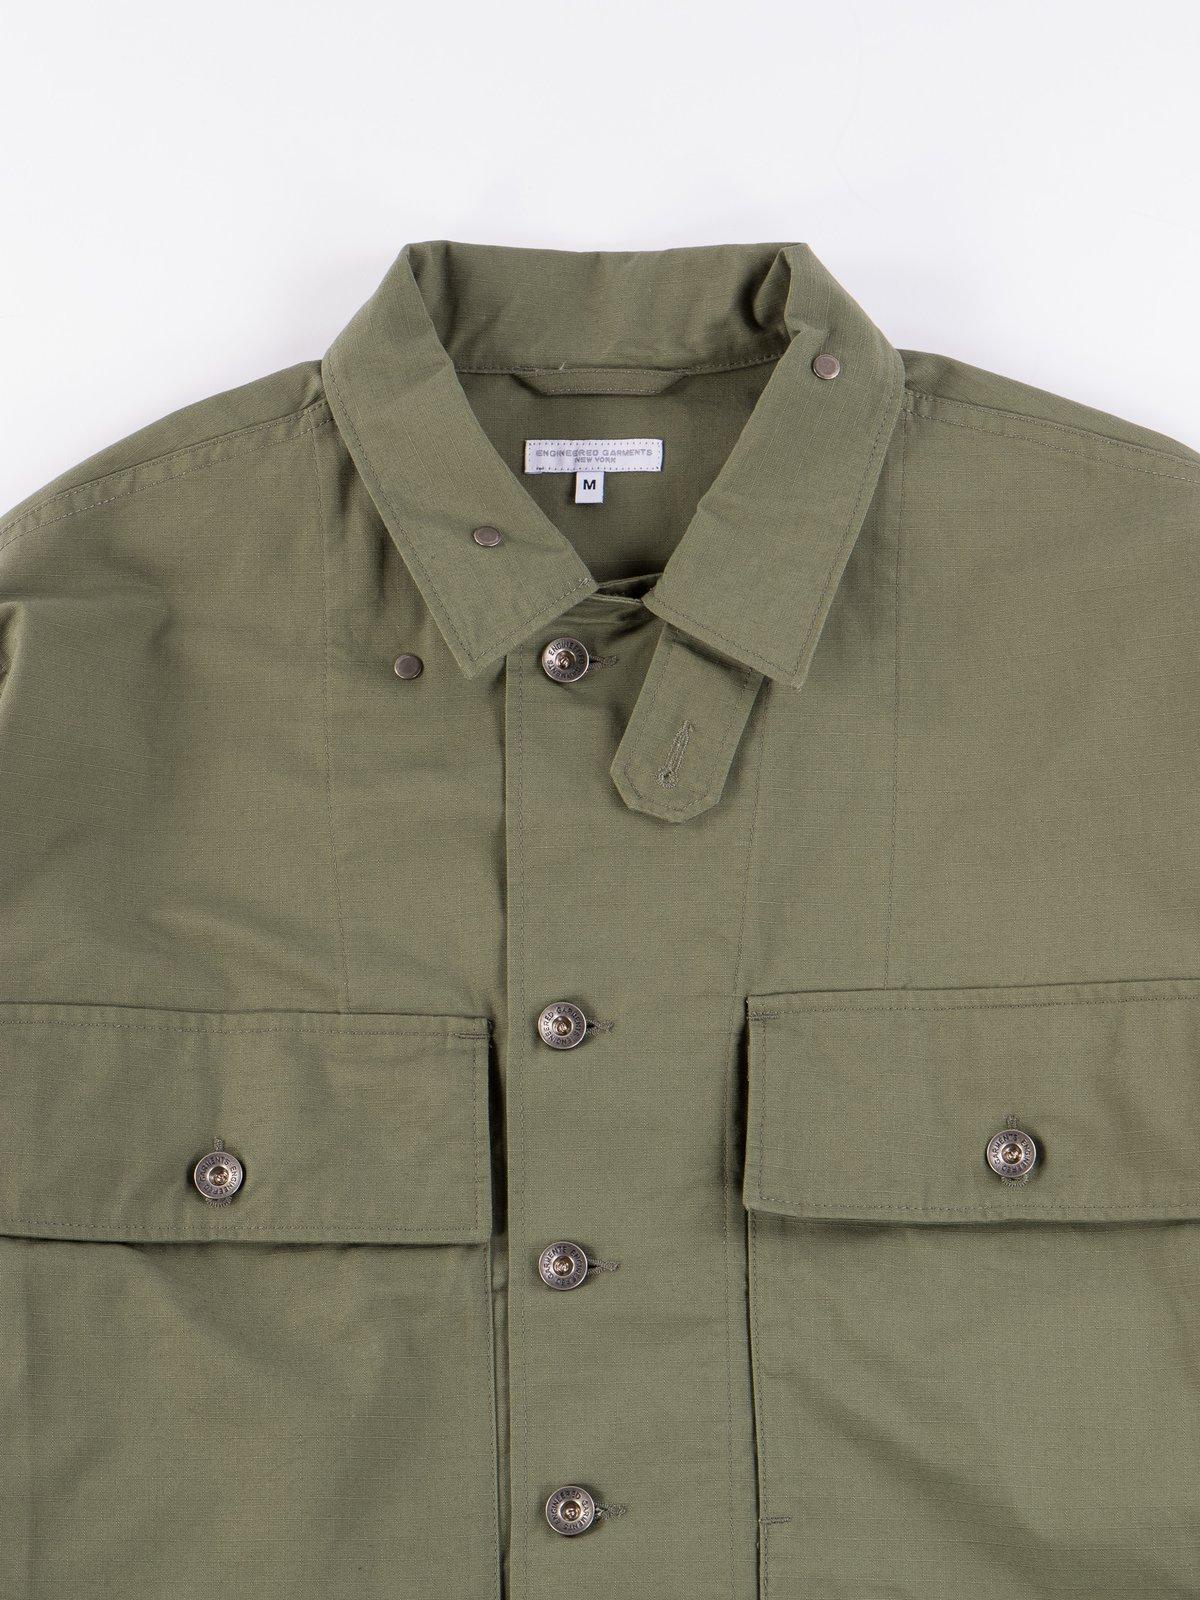 Olive Cotton Ripstop M43/2 Shirt Jacket - Image 4